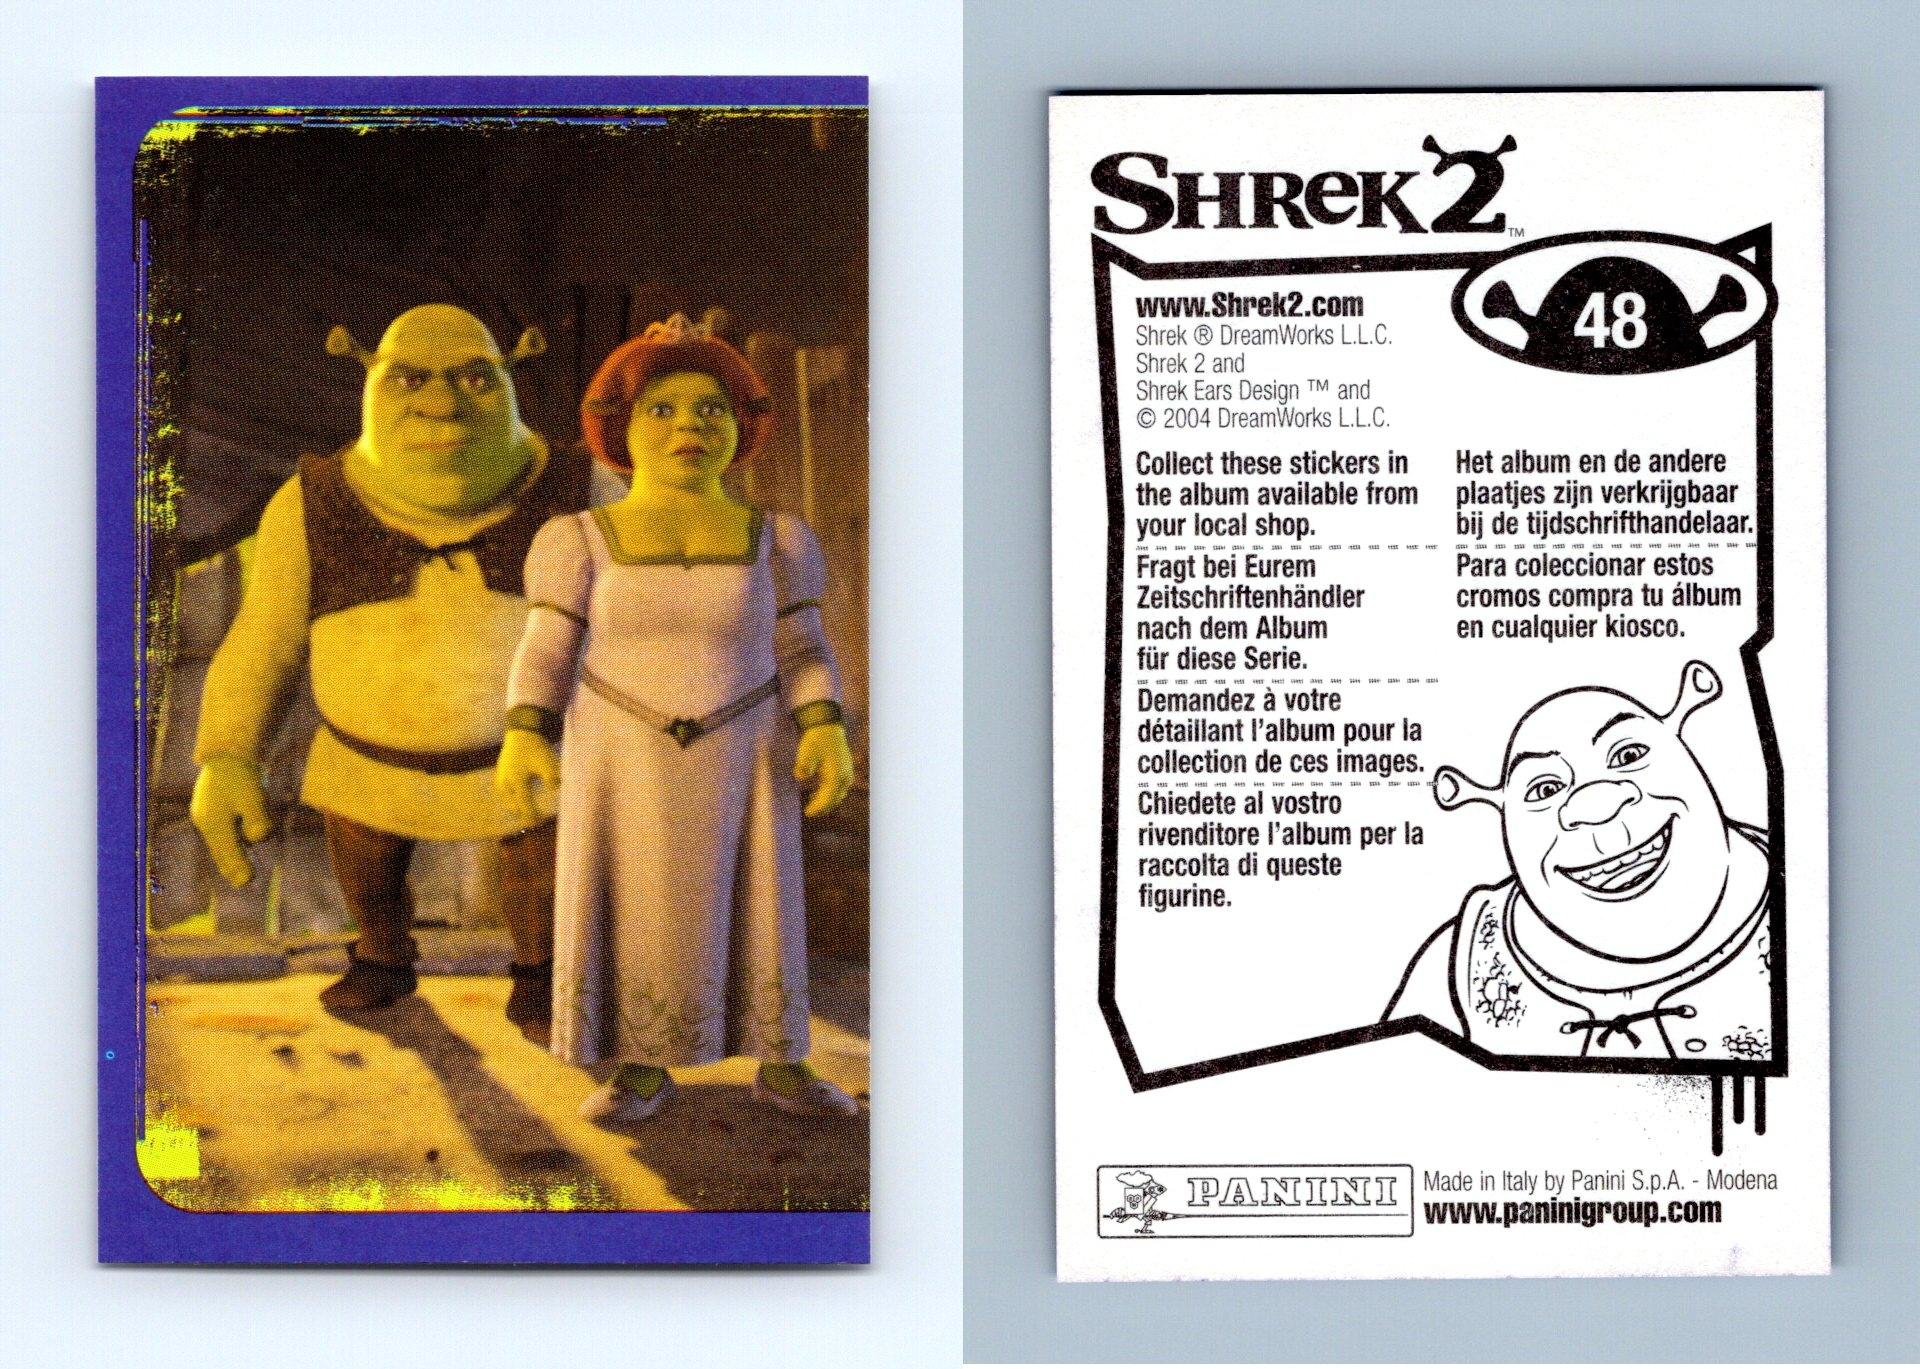 Shrek 2 48 Panini 2004 Dreamworks Sticker